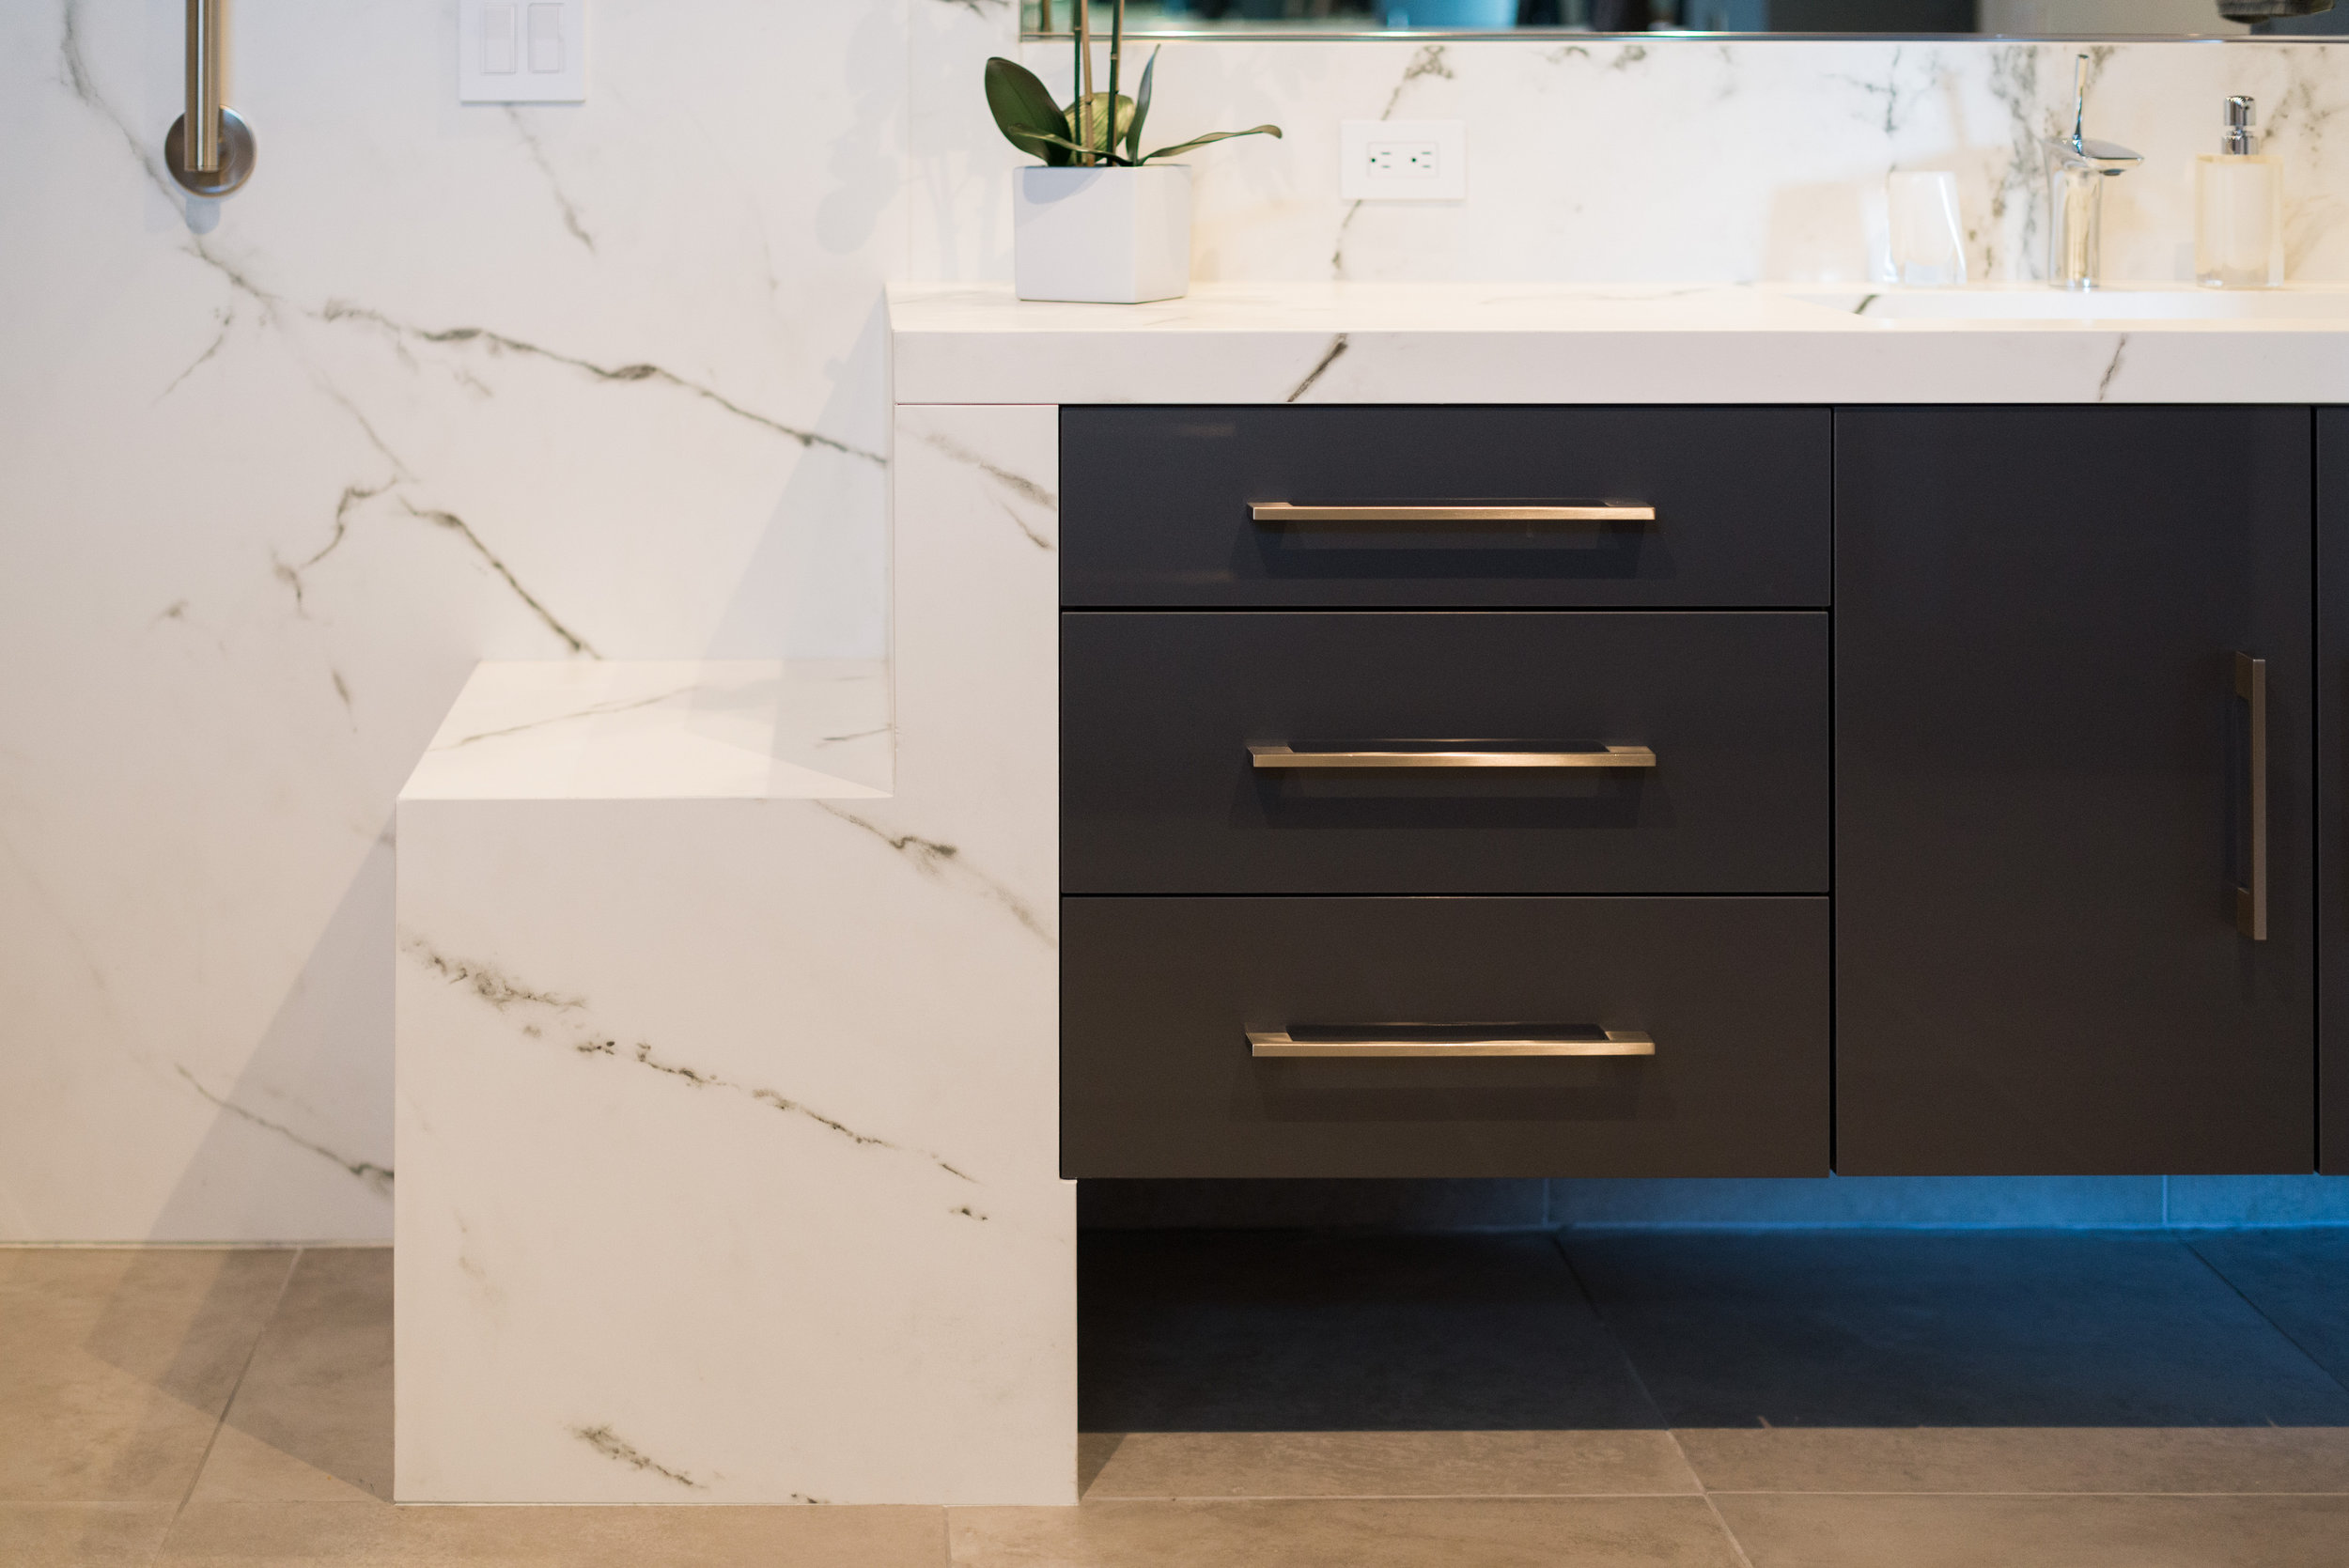 Bathroom Bench Seat - Cody Design Studio